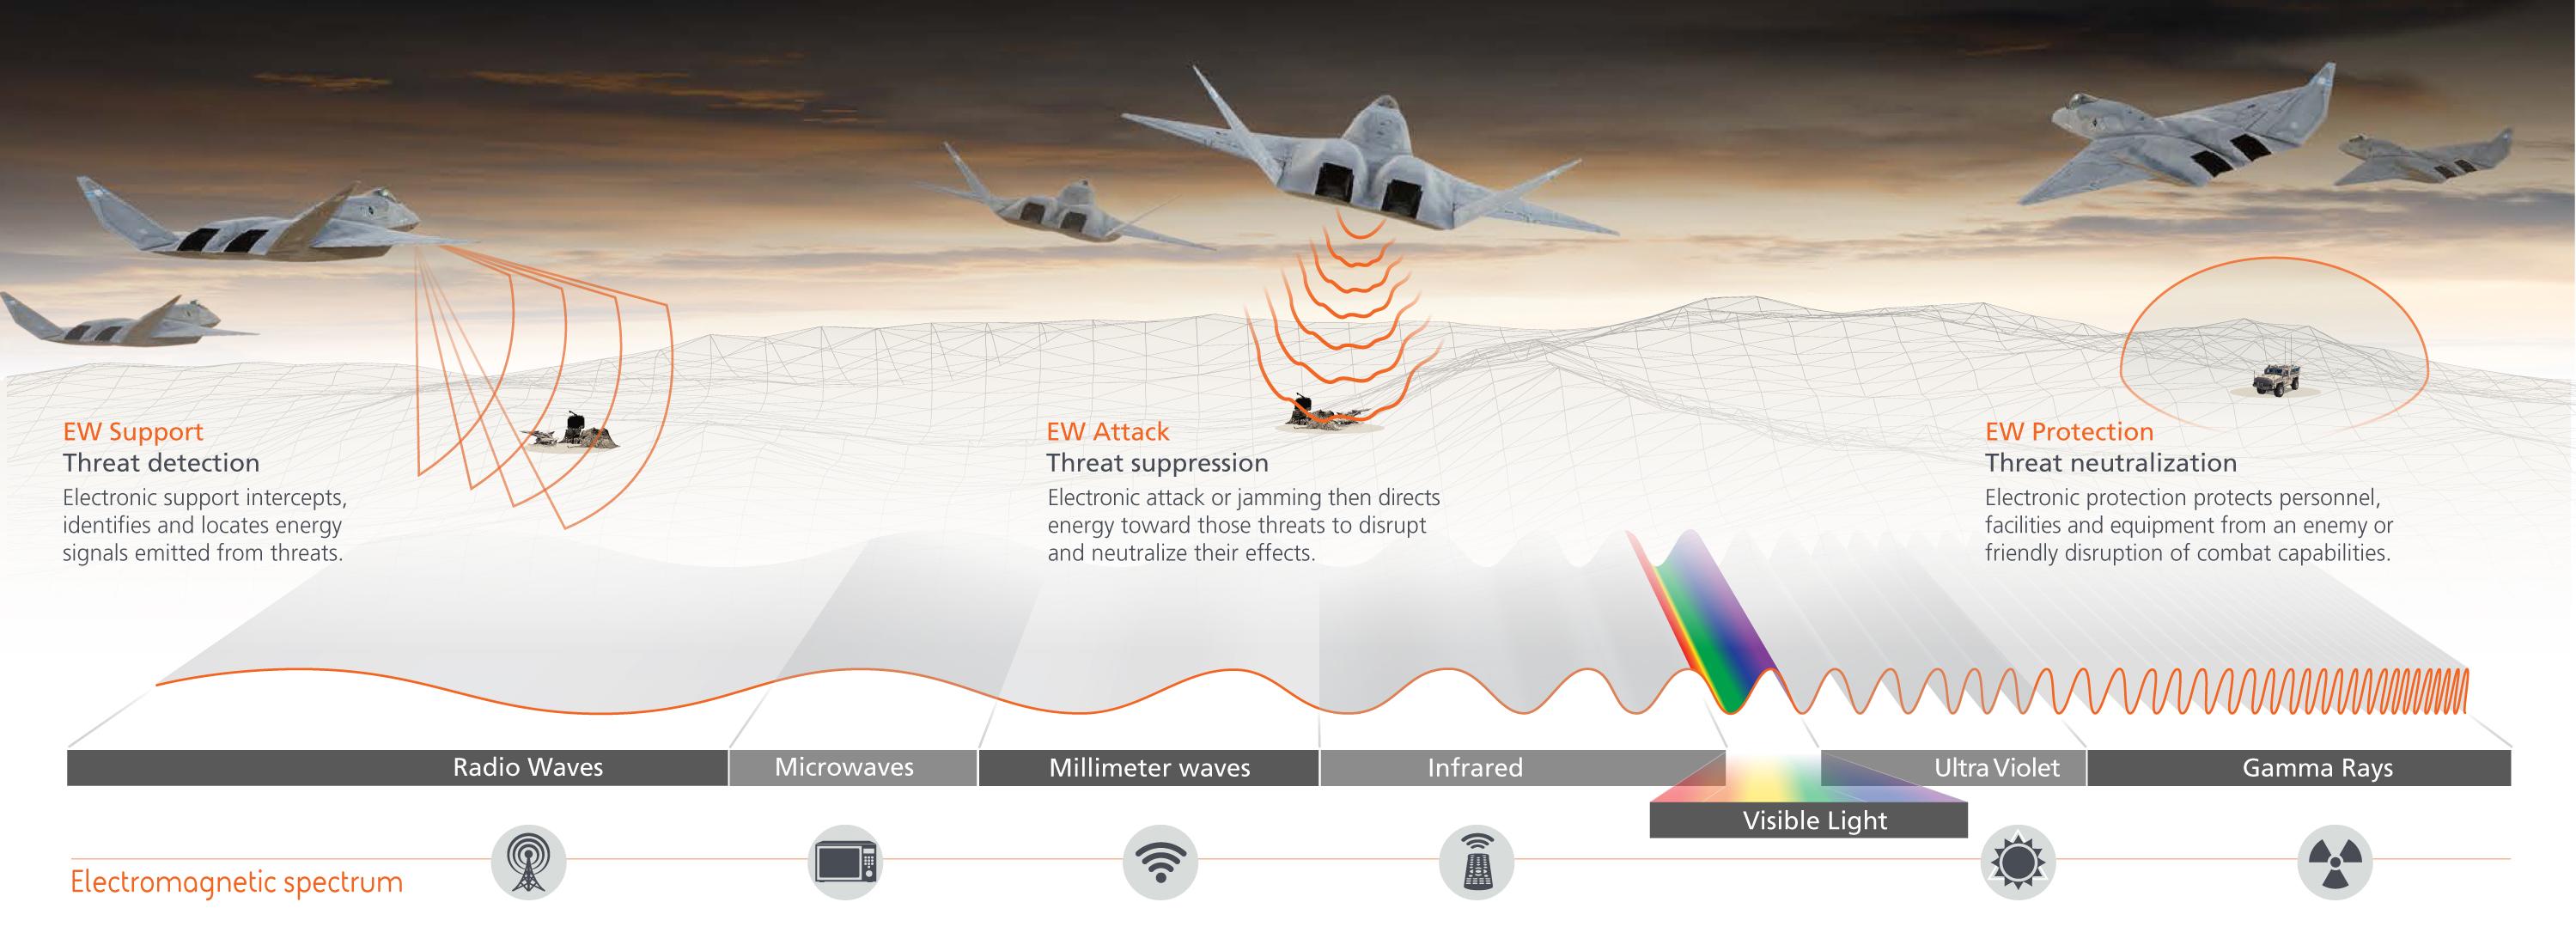 Paradigm shifts underway for electromagnetic spectrum